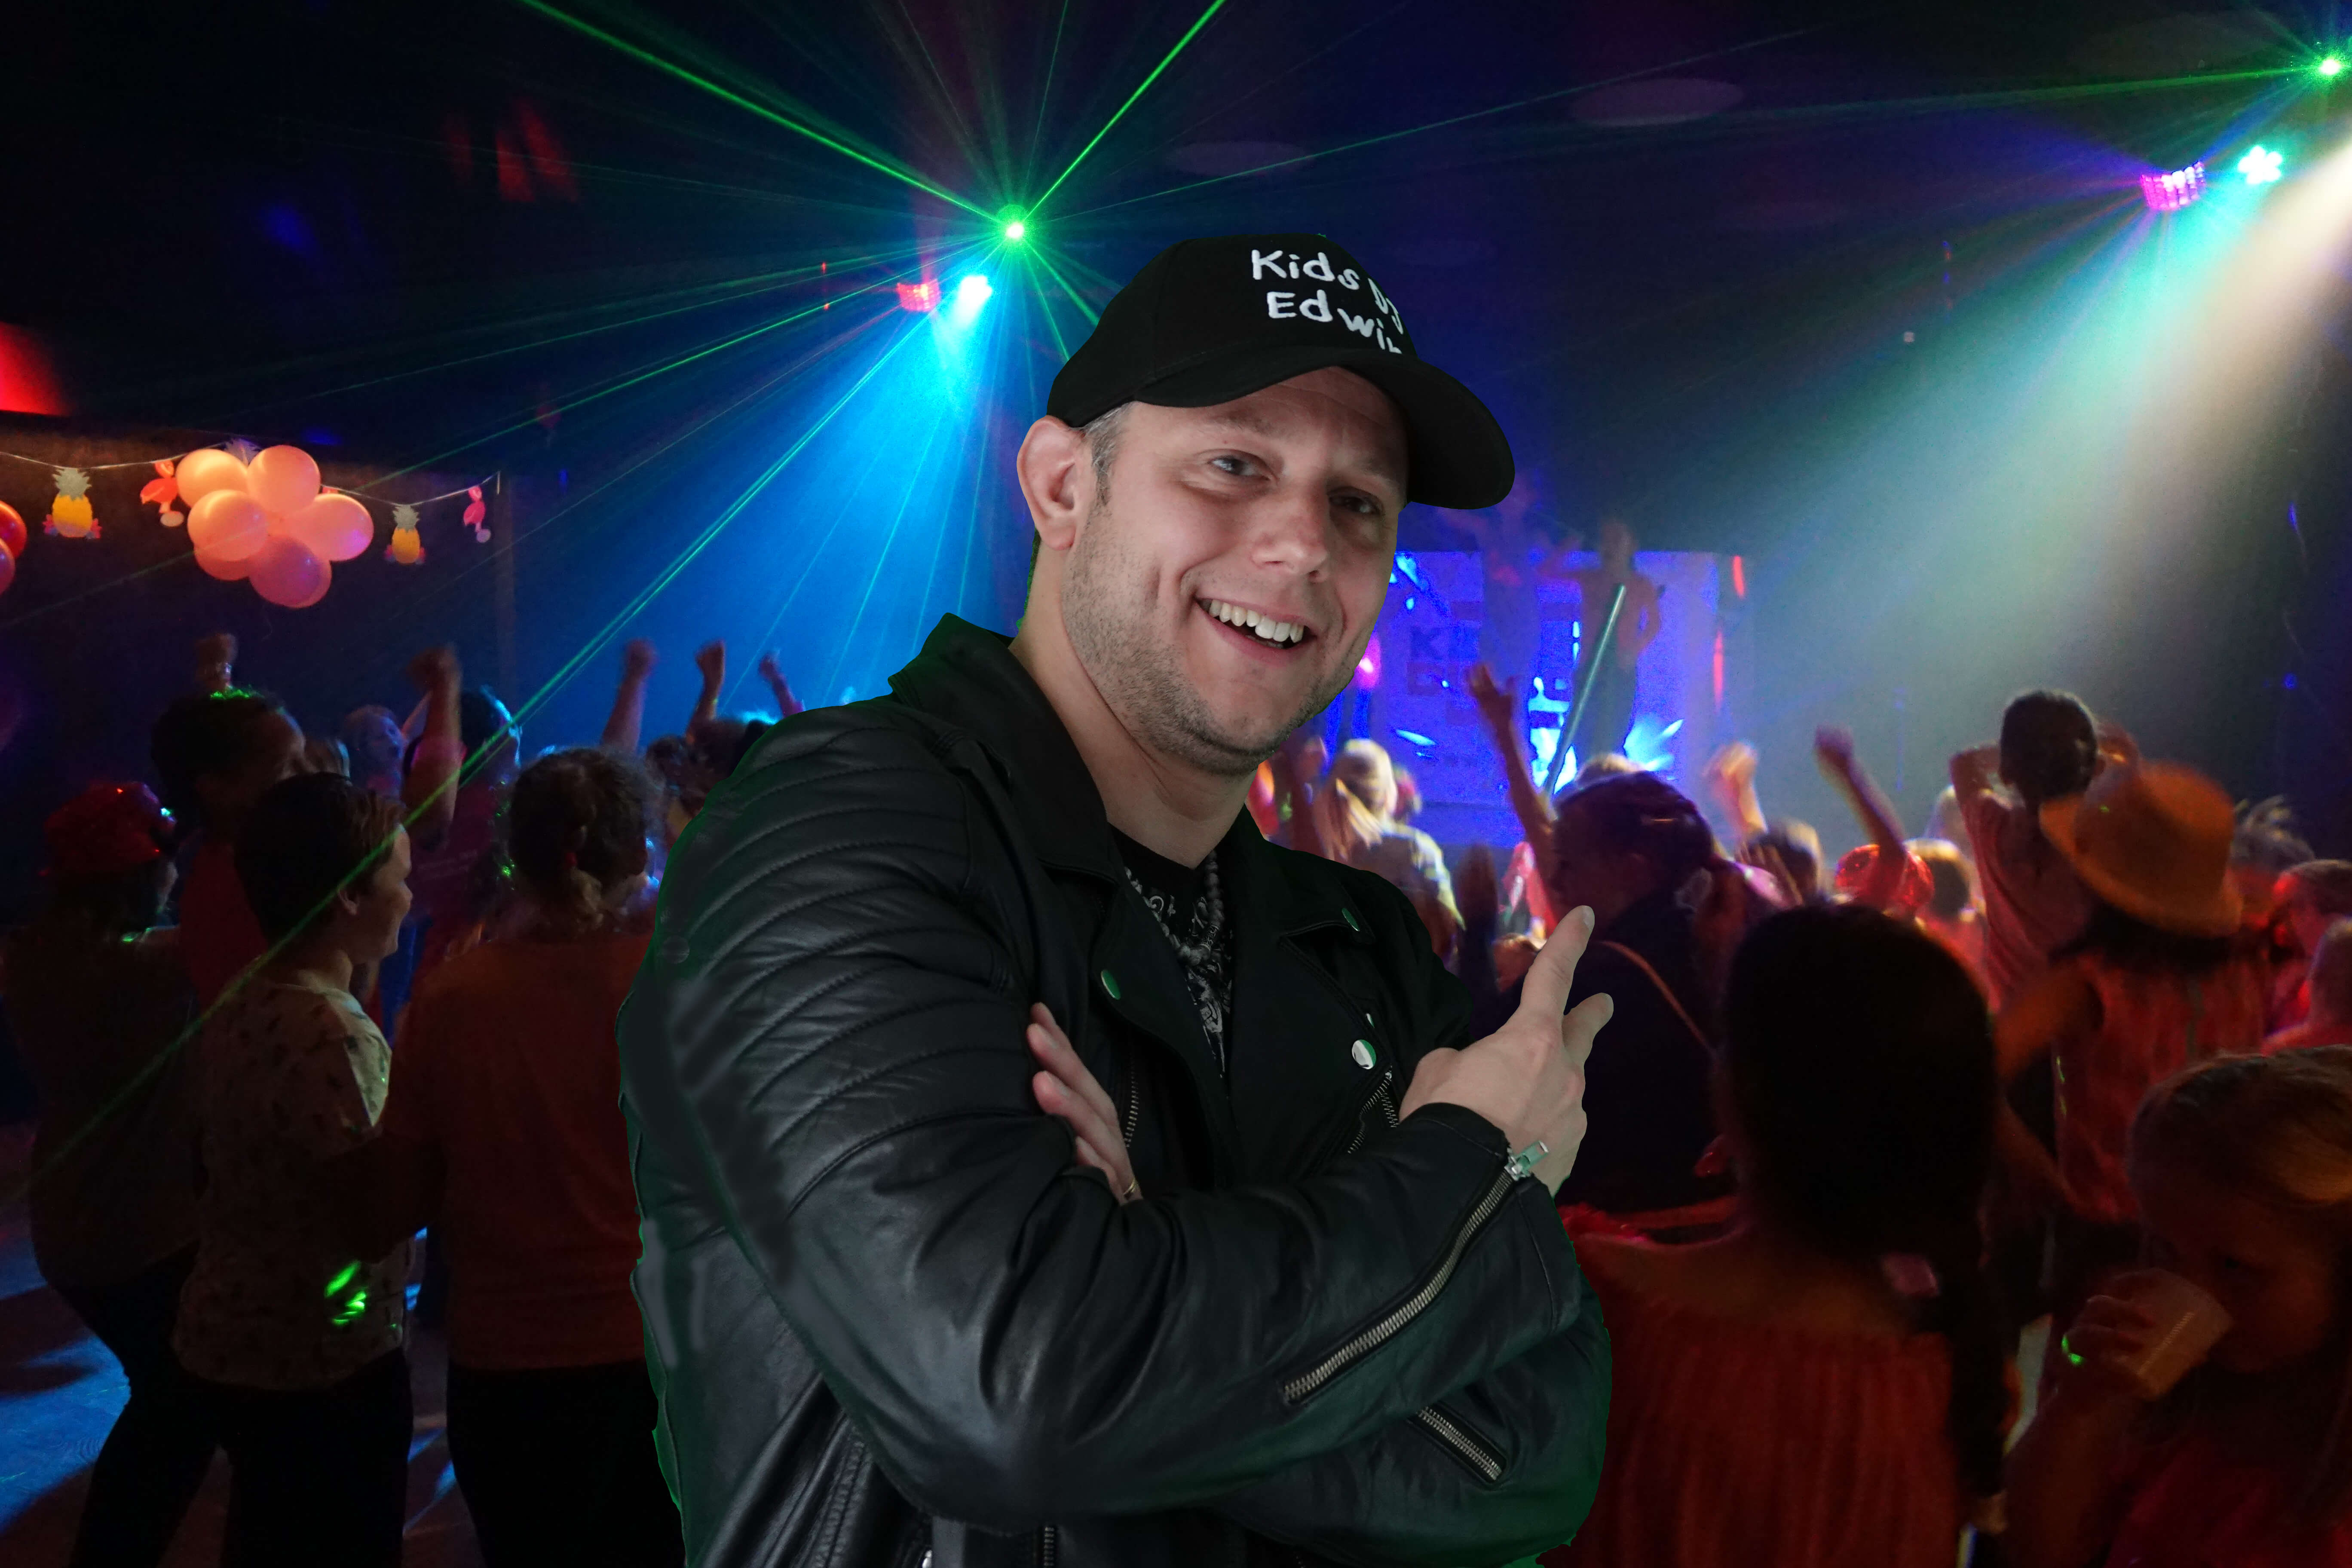 Kids DJ Edwin